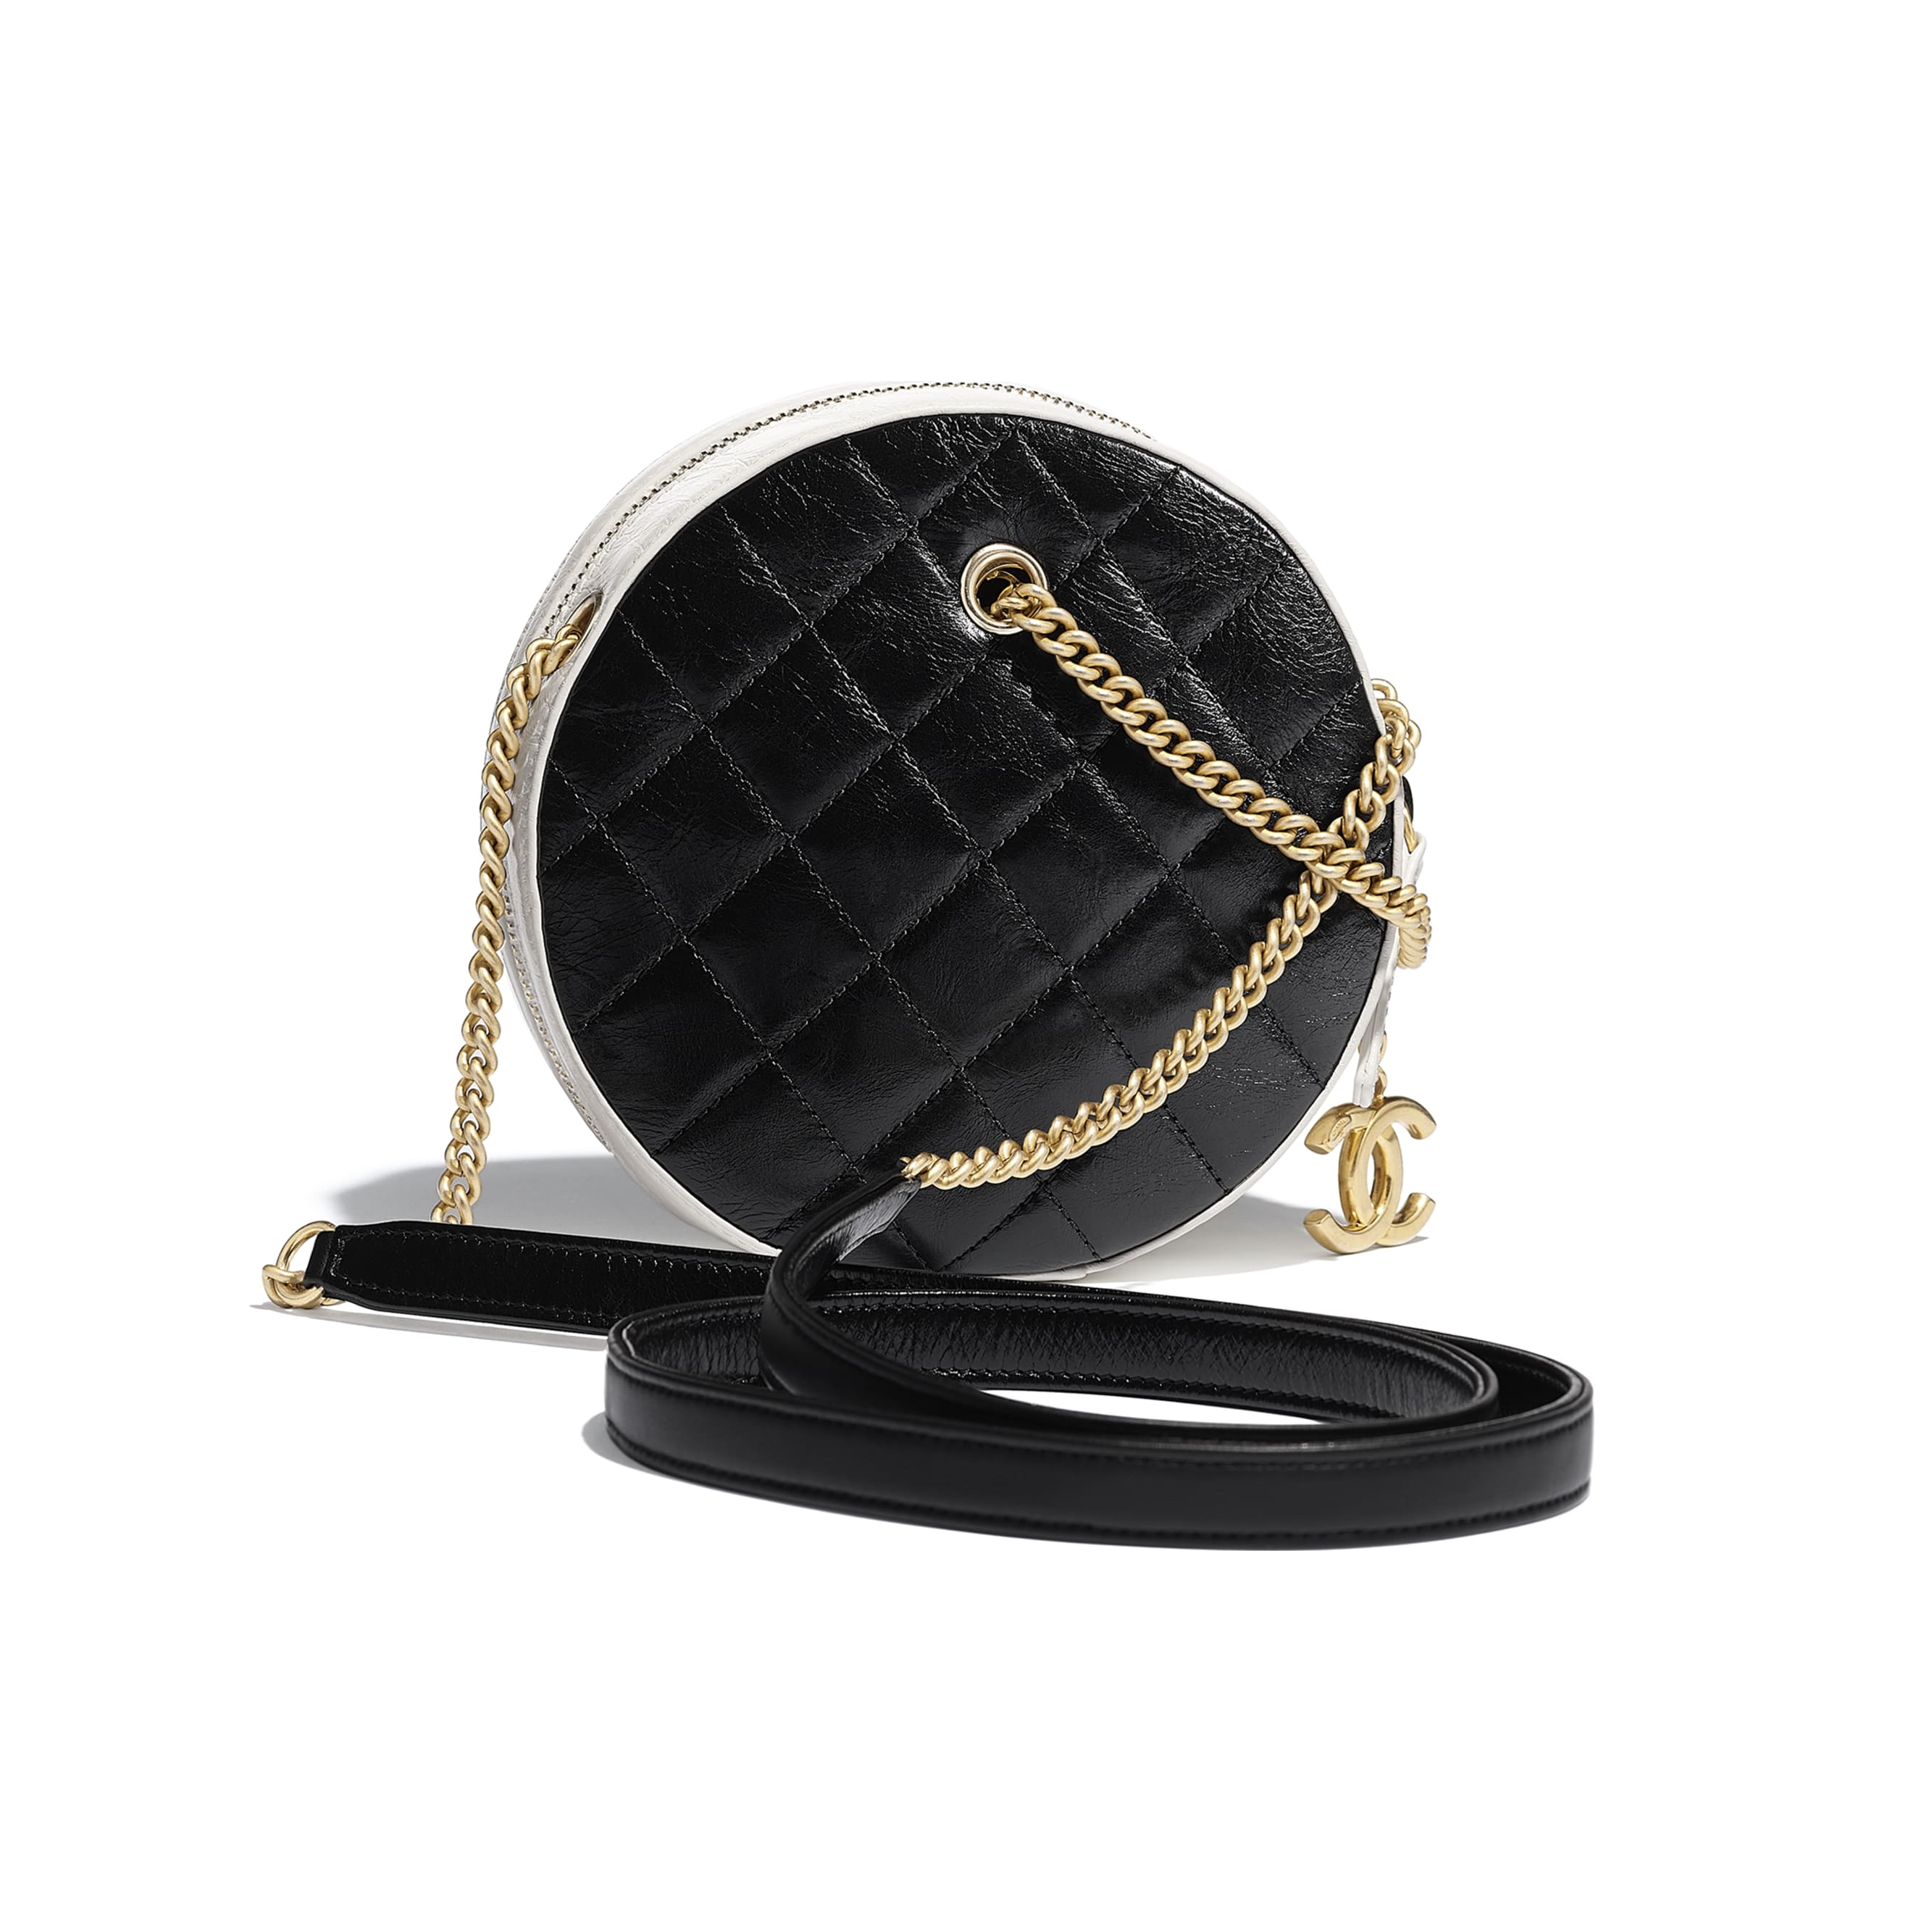 525d082e8082 ... Small Round Bag - Black   White - Crumpled Calfskin